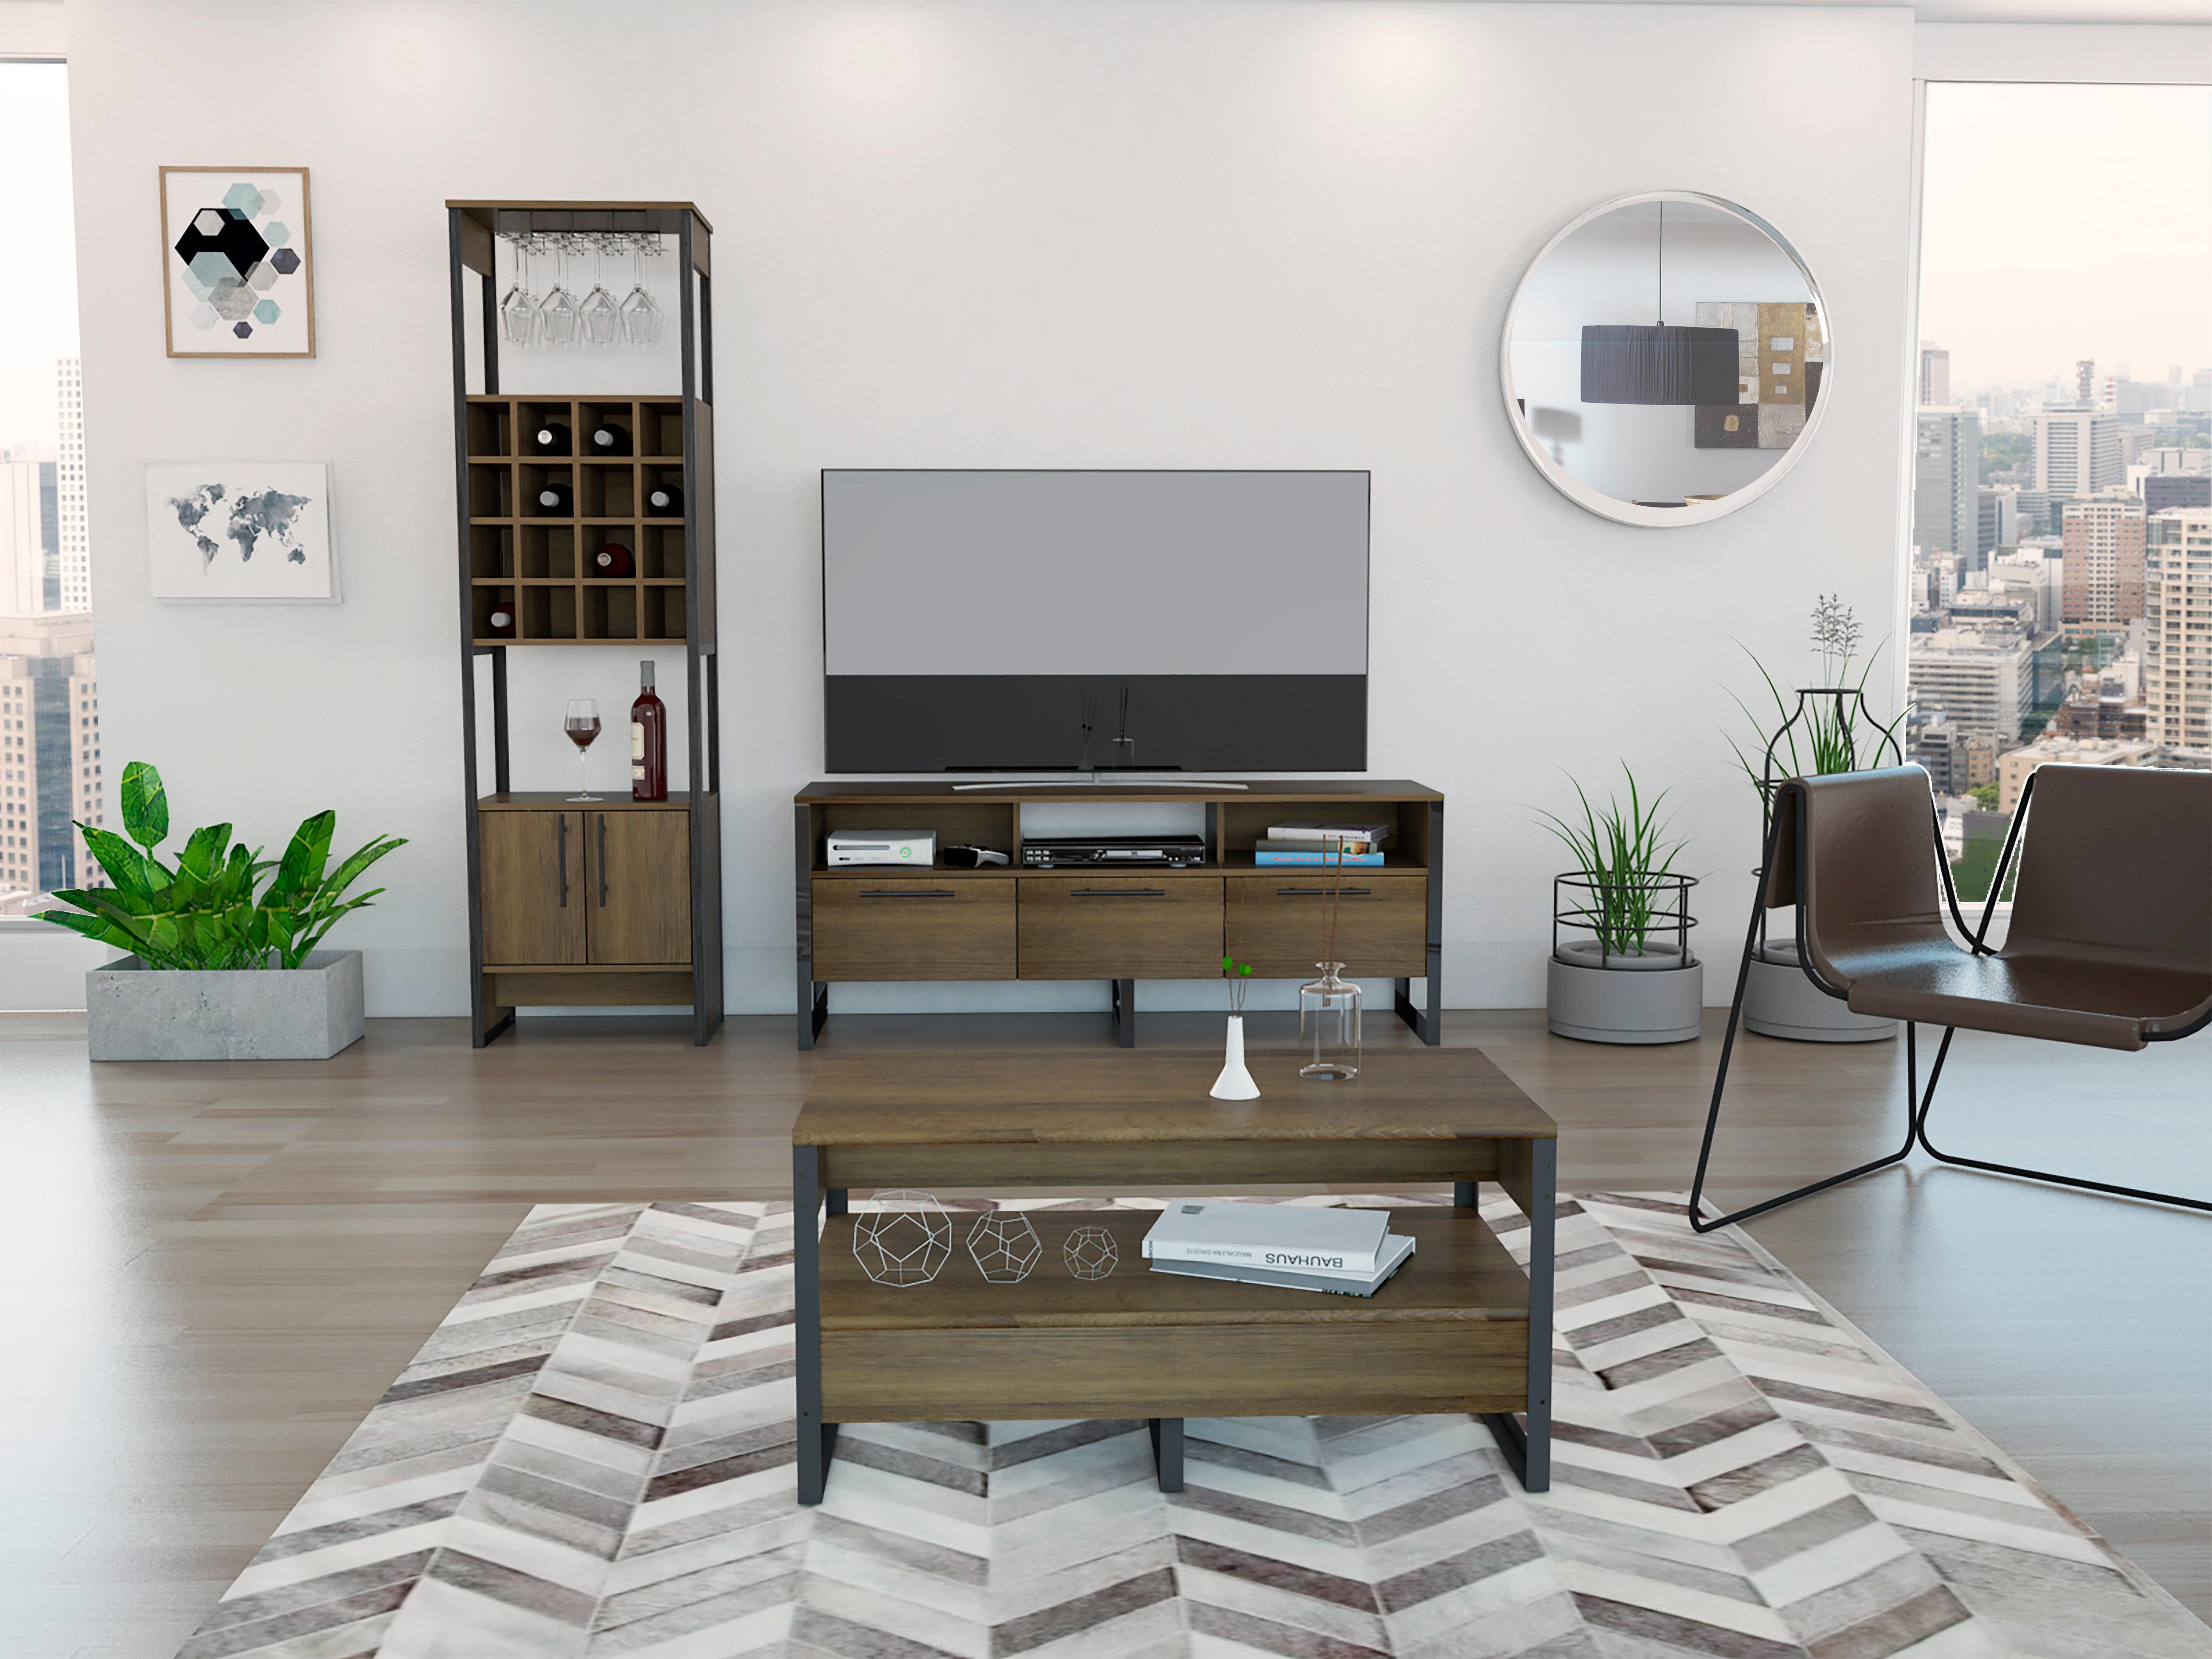 3 Pc Living Room Set Magnum Includes Bar Cabinet Tv Stand